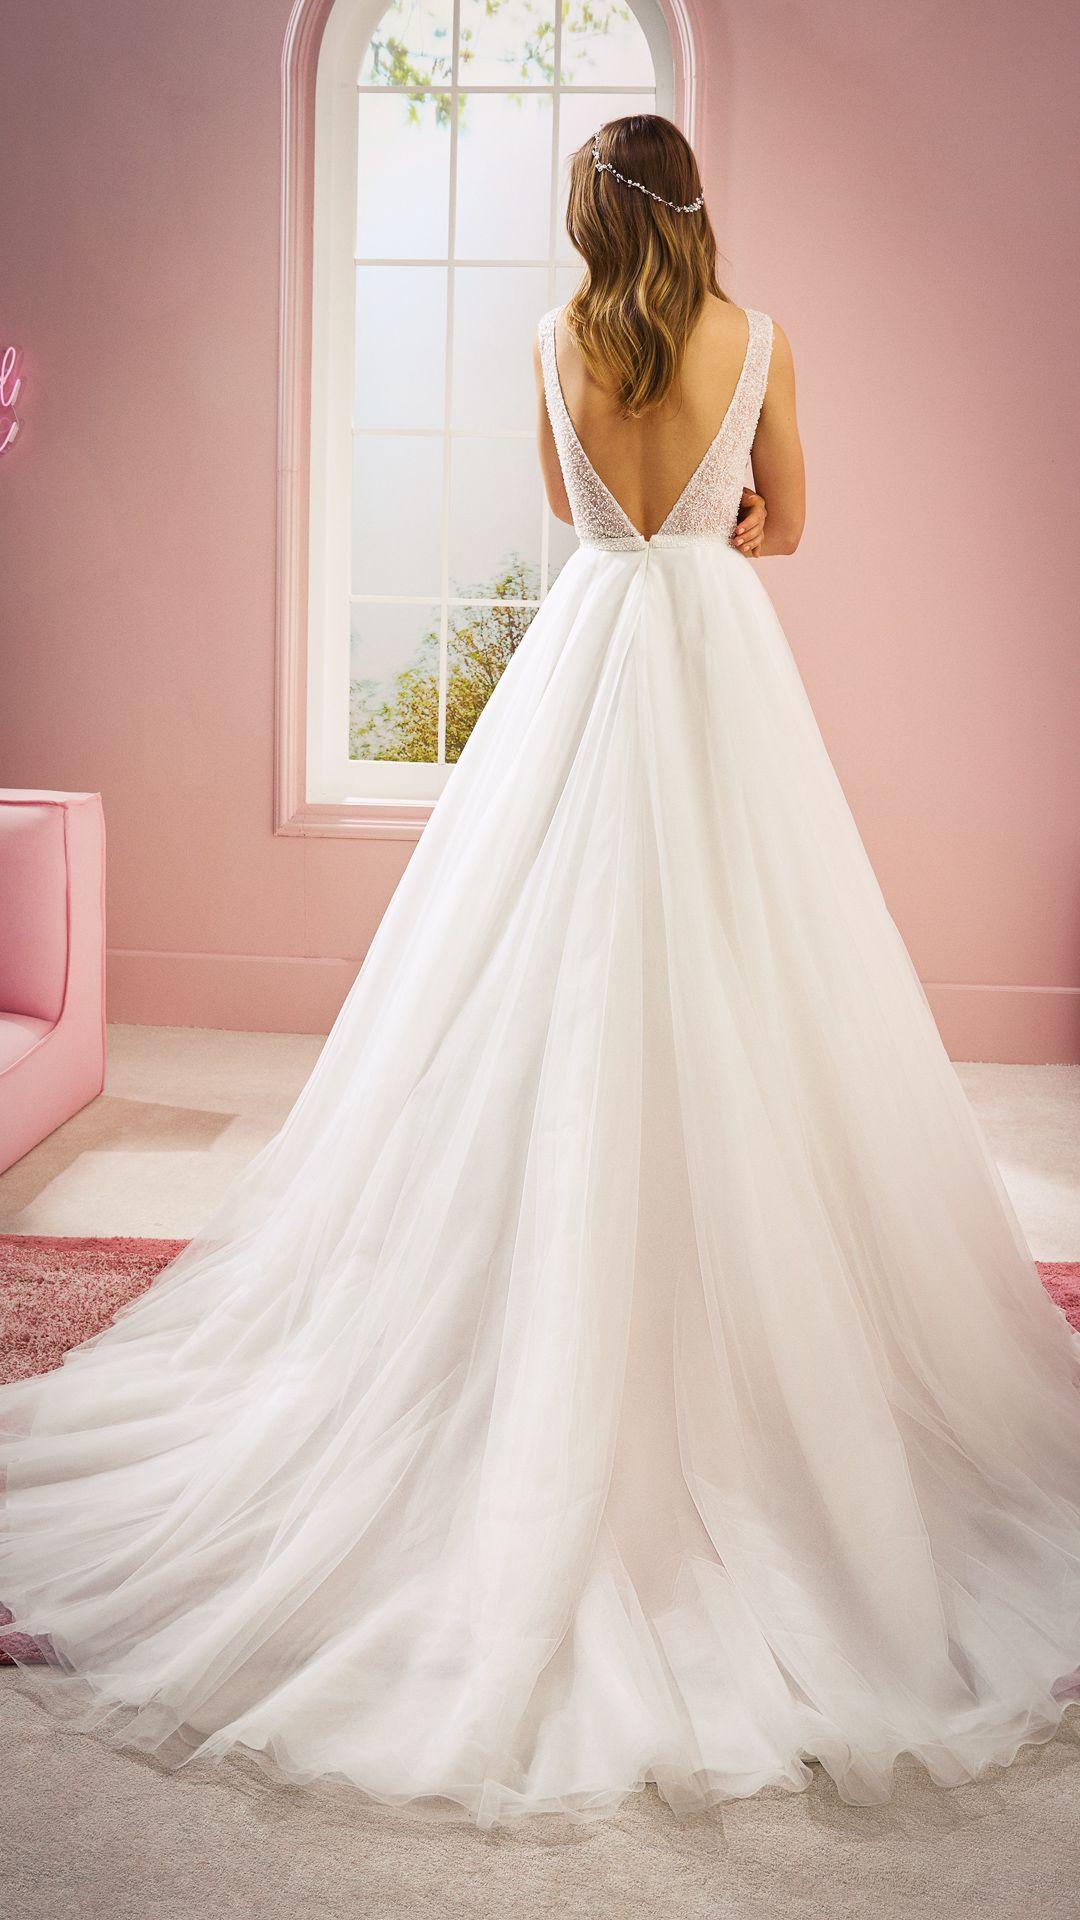 Hochzeitskleider 20 White One Kollektion Modell: GLORIA-C